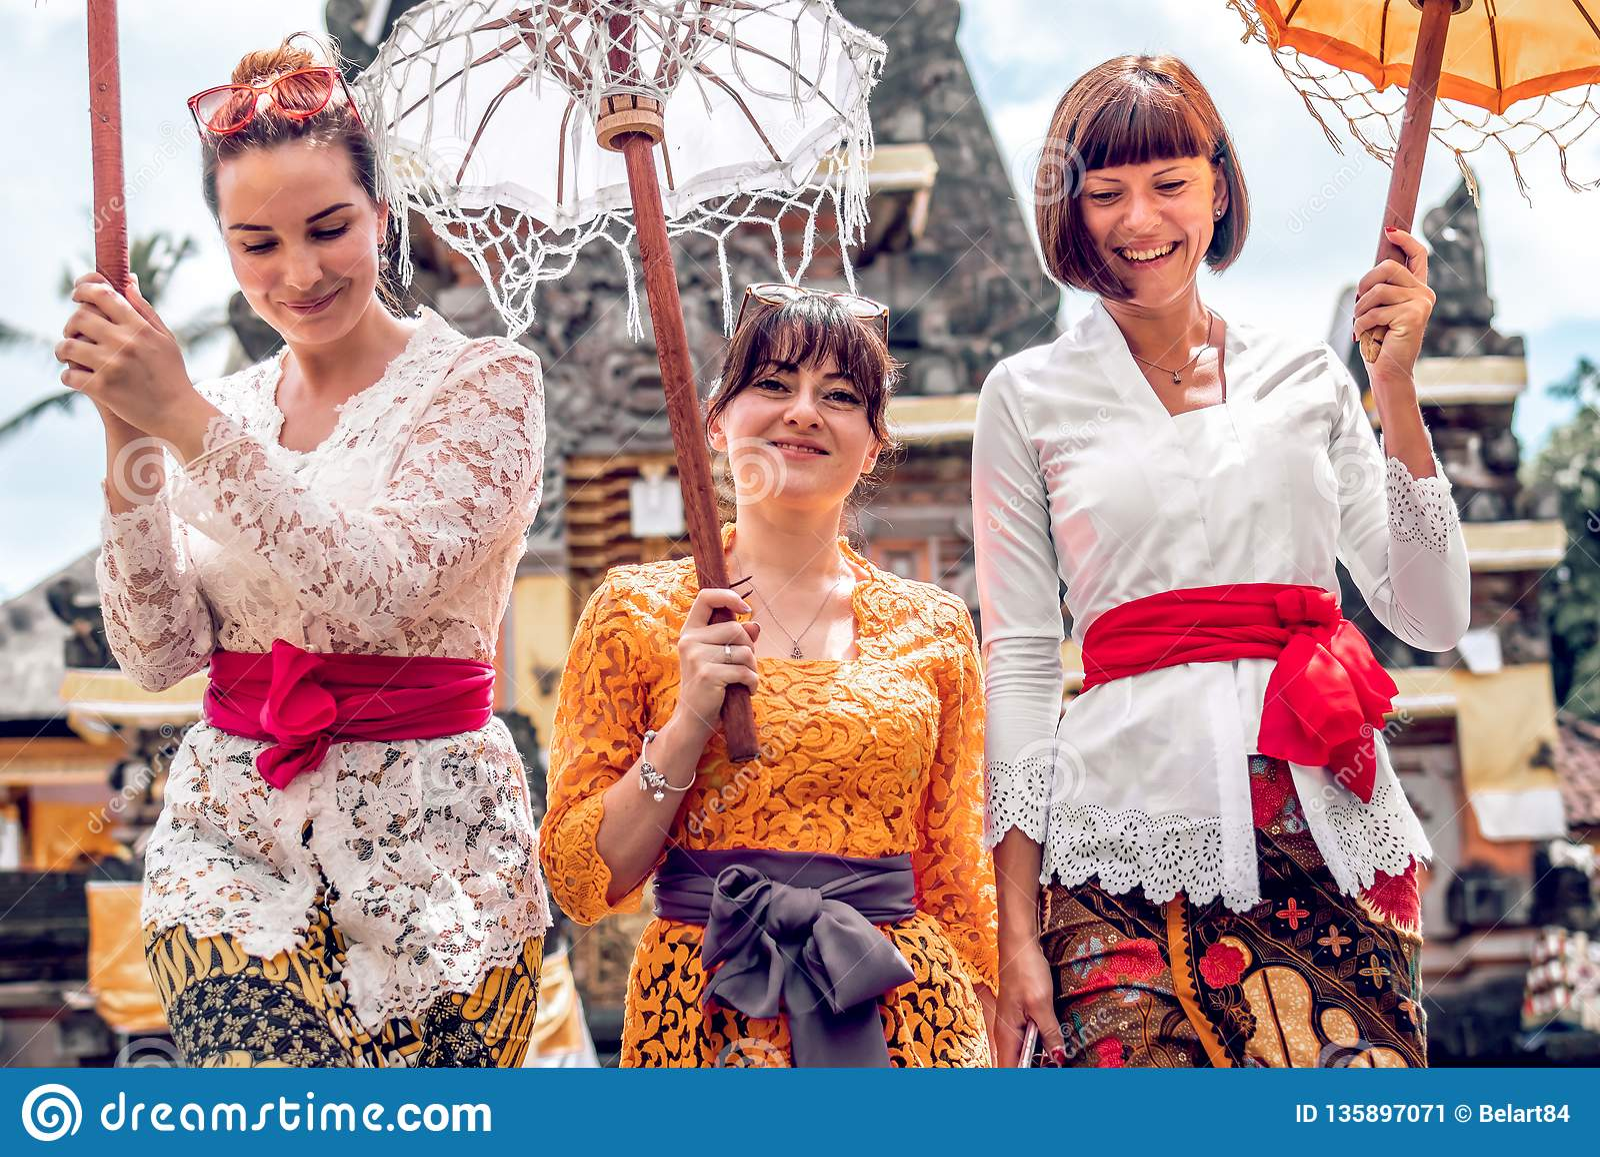 Bali Indonesia December 26 2018 European Women In